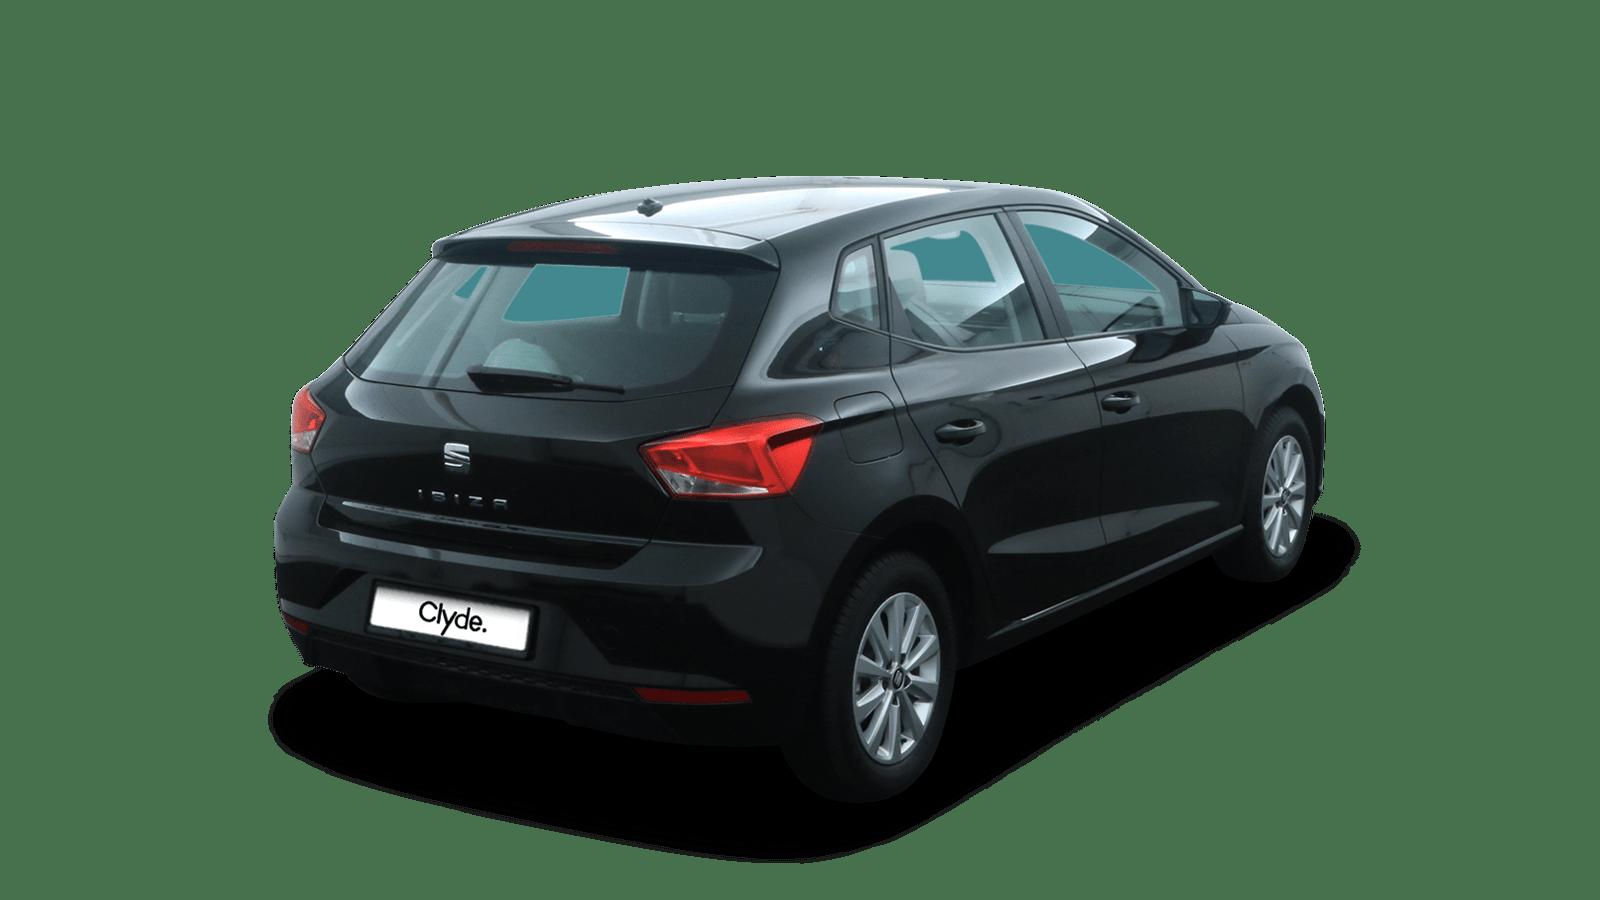 SEAT Ibiza Schwarz rückansicht - Clyde Auto-Abo